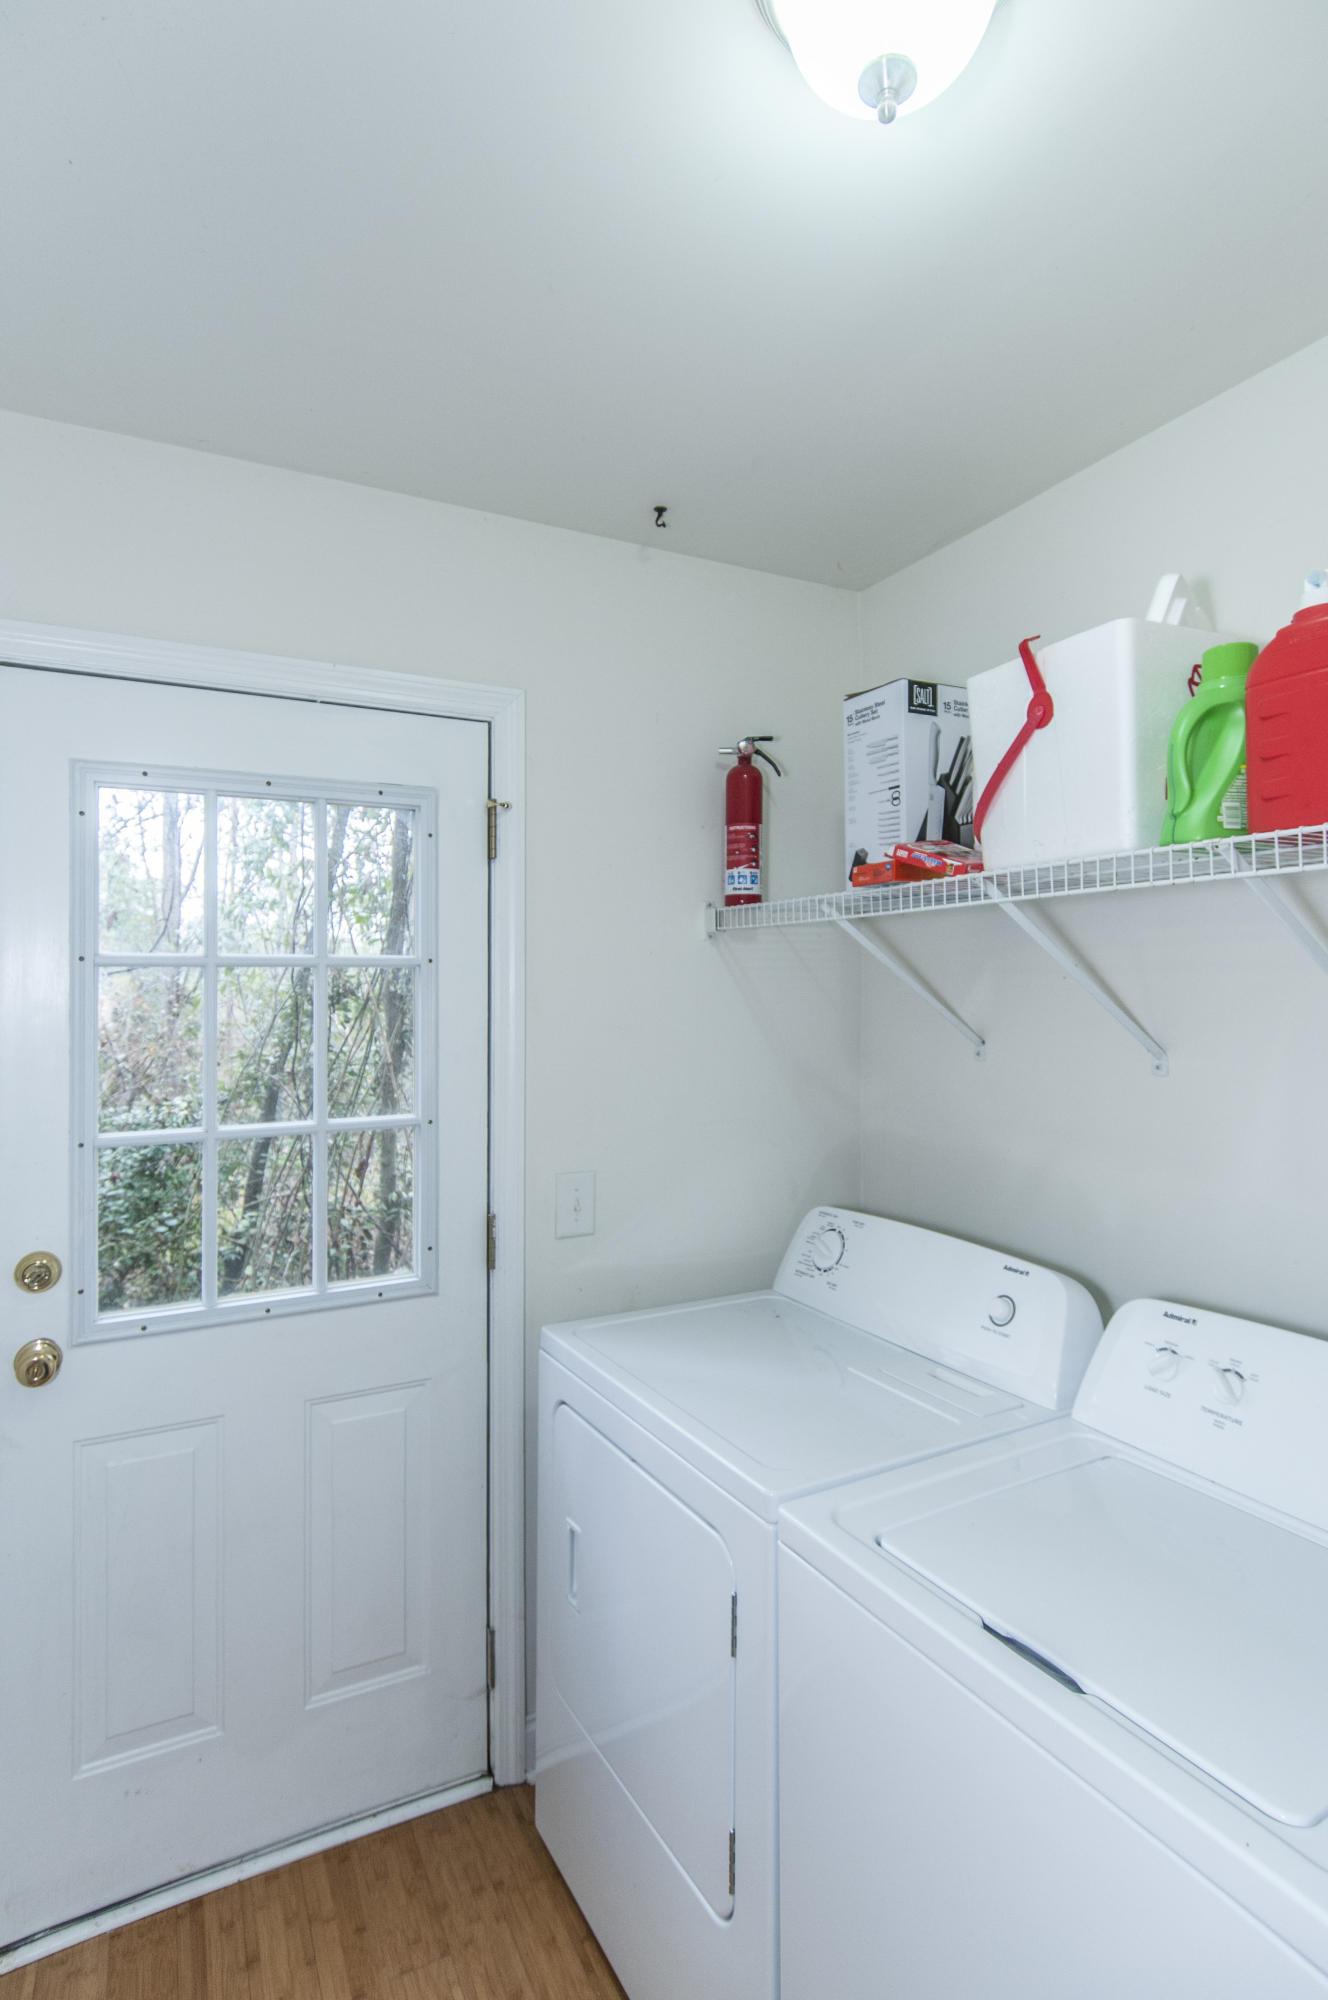 Longbranch Point Homes For Sale - 940 Estates, Charleston, SC - 2